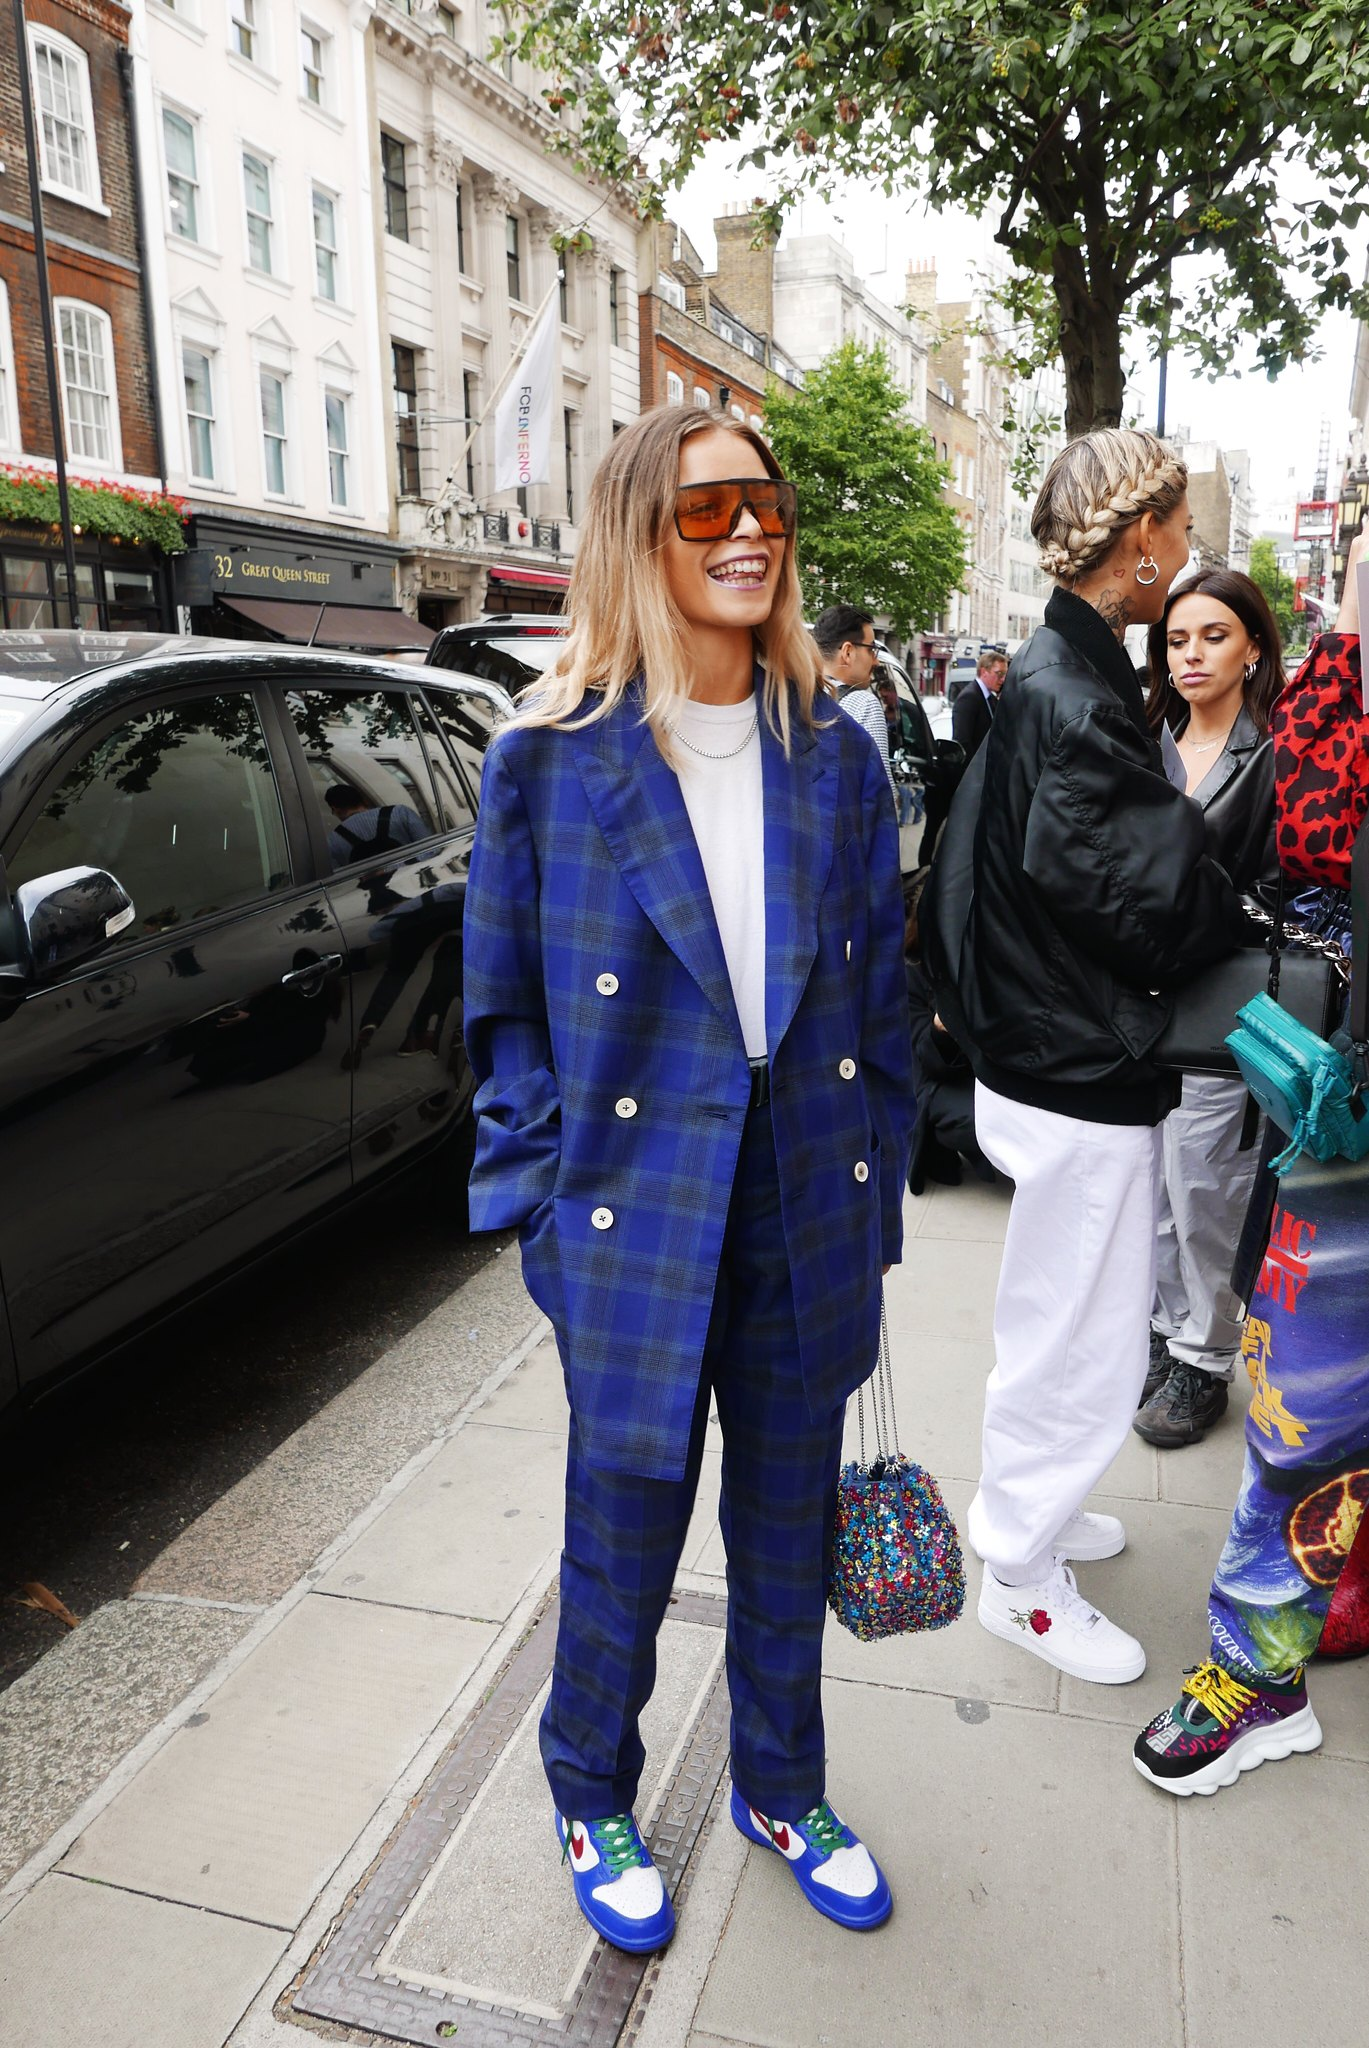 London fashion week 2018